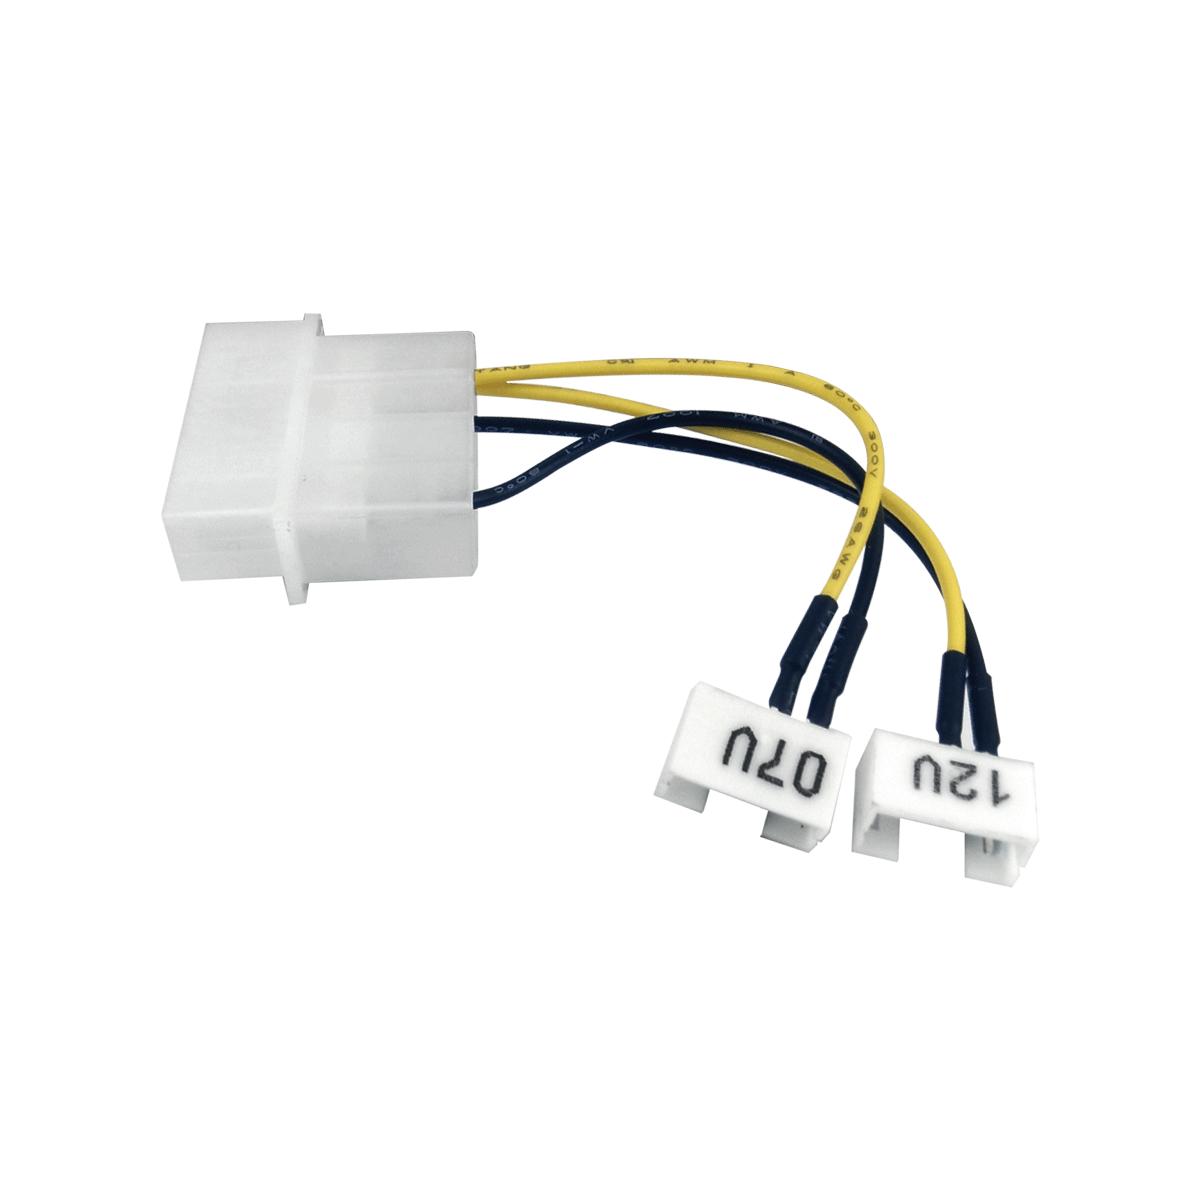 Molex to 7V and 12V GPU Adapter